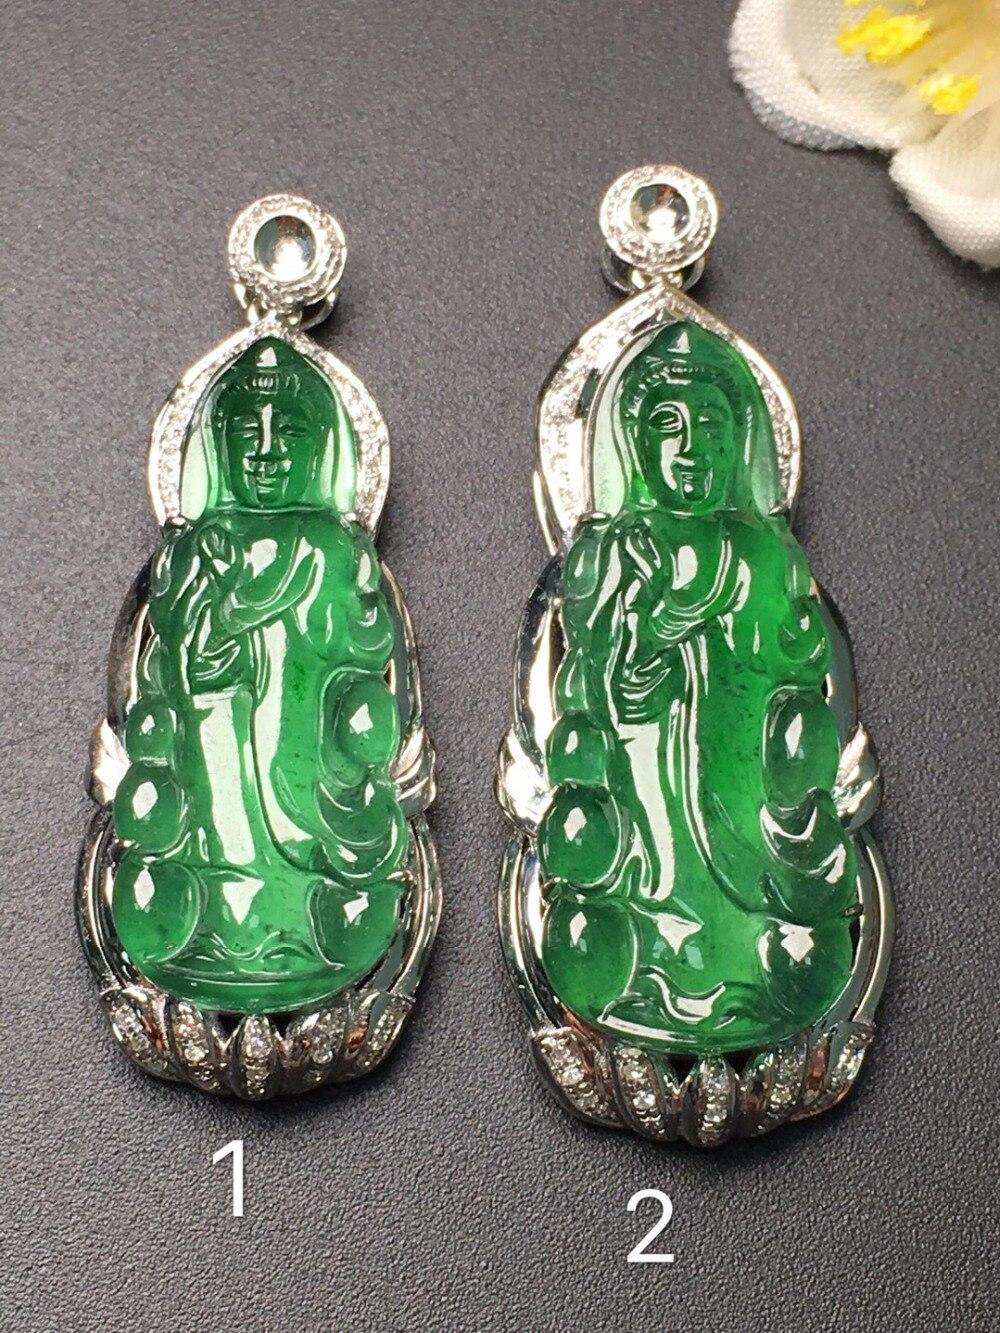 Real 18K White Gold Natural Green Jade Avalokitesvara Bodhisattva Bouddha Jade Female Pendant Necklace for Women Fine Pendants